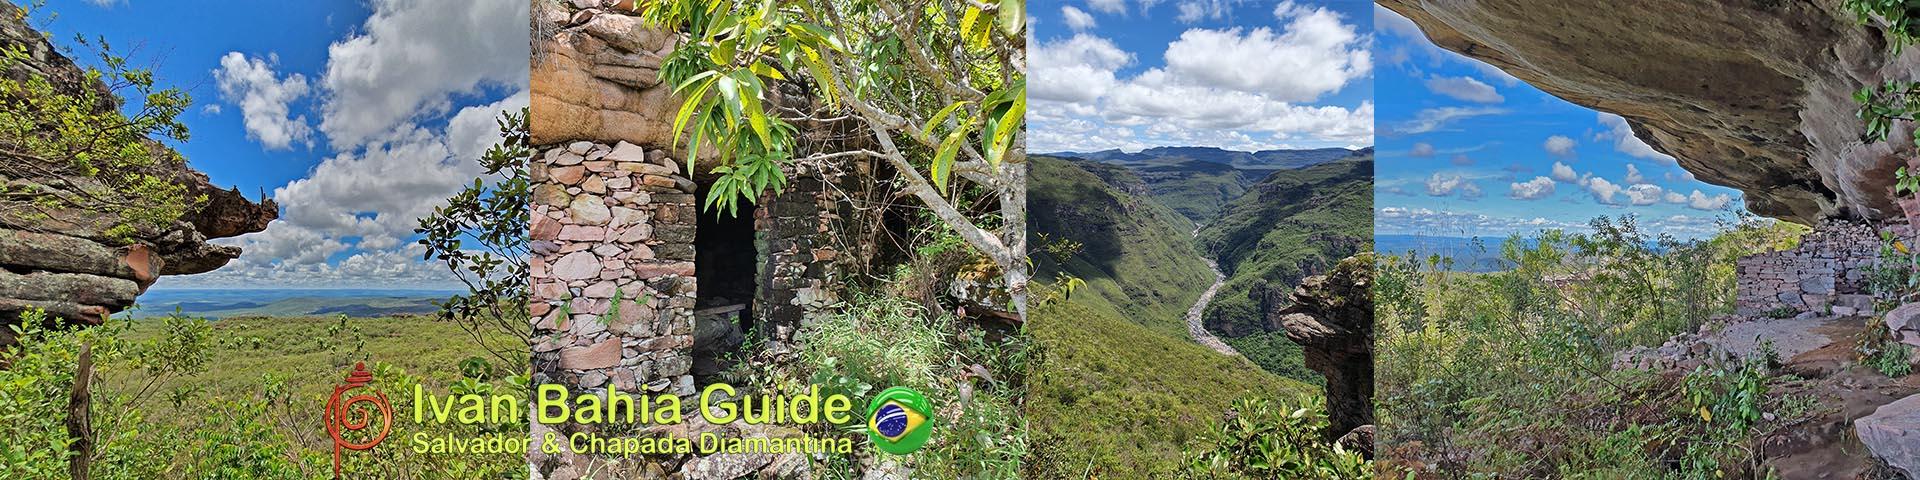 Ivan Bahia tour-guide / 4x4 expedition Chapada Diamantina Parc National (known as the 'Brazilian Grand Canyon') / #ibtg #ibg #ivanbahiaguide #ivanbahiatravelguide #zenturturismo #ivanchapadadiamantinaguide #valedopati #patyvalley #pati #viapati #valecapao #ivanchapadaguide #chapadadiamantinatransfer #chapadatrekking #chapadaroots #chapadasoul #lencoisbahia #chapadadiamantinatrekking #ivanchapadadiamantinaguide  #chapadadiamantinaguide  #guidechapadadiamantina #lencois #lençois #chapadaadventuredaniel #diamondmountains #zentur # #guiachapadadiamantina #chapadaaventure #discoverchapada #chapadadiamond #chapadasoul #diamantinatrip  #tripadvisor #bahiametisse, #fernandobingre, #ivansalvadorbahia #salvadorbahiaTravel #toursbylocals #fotosbahia #bahiafotos #chapadadiamantinanationalpark #yourtoursbrazil #maurotours #bahiatopturismo #bahiapremium #maisbahiaturismo #fernandobingretourguide #cassiturismo